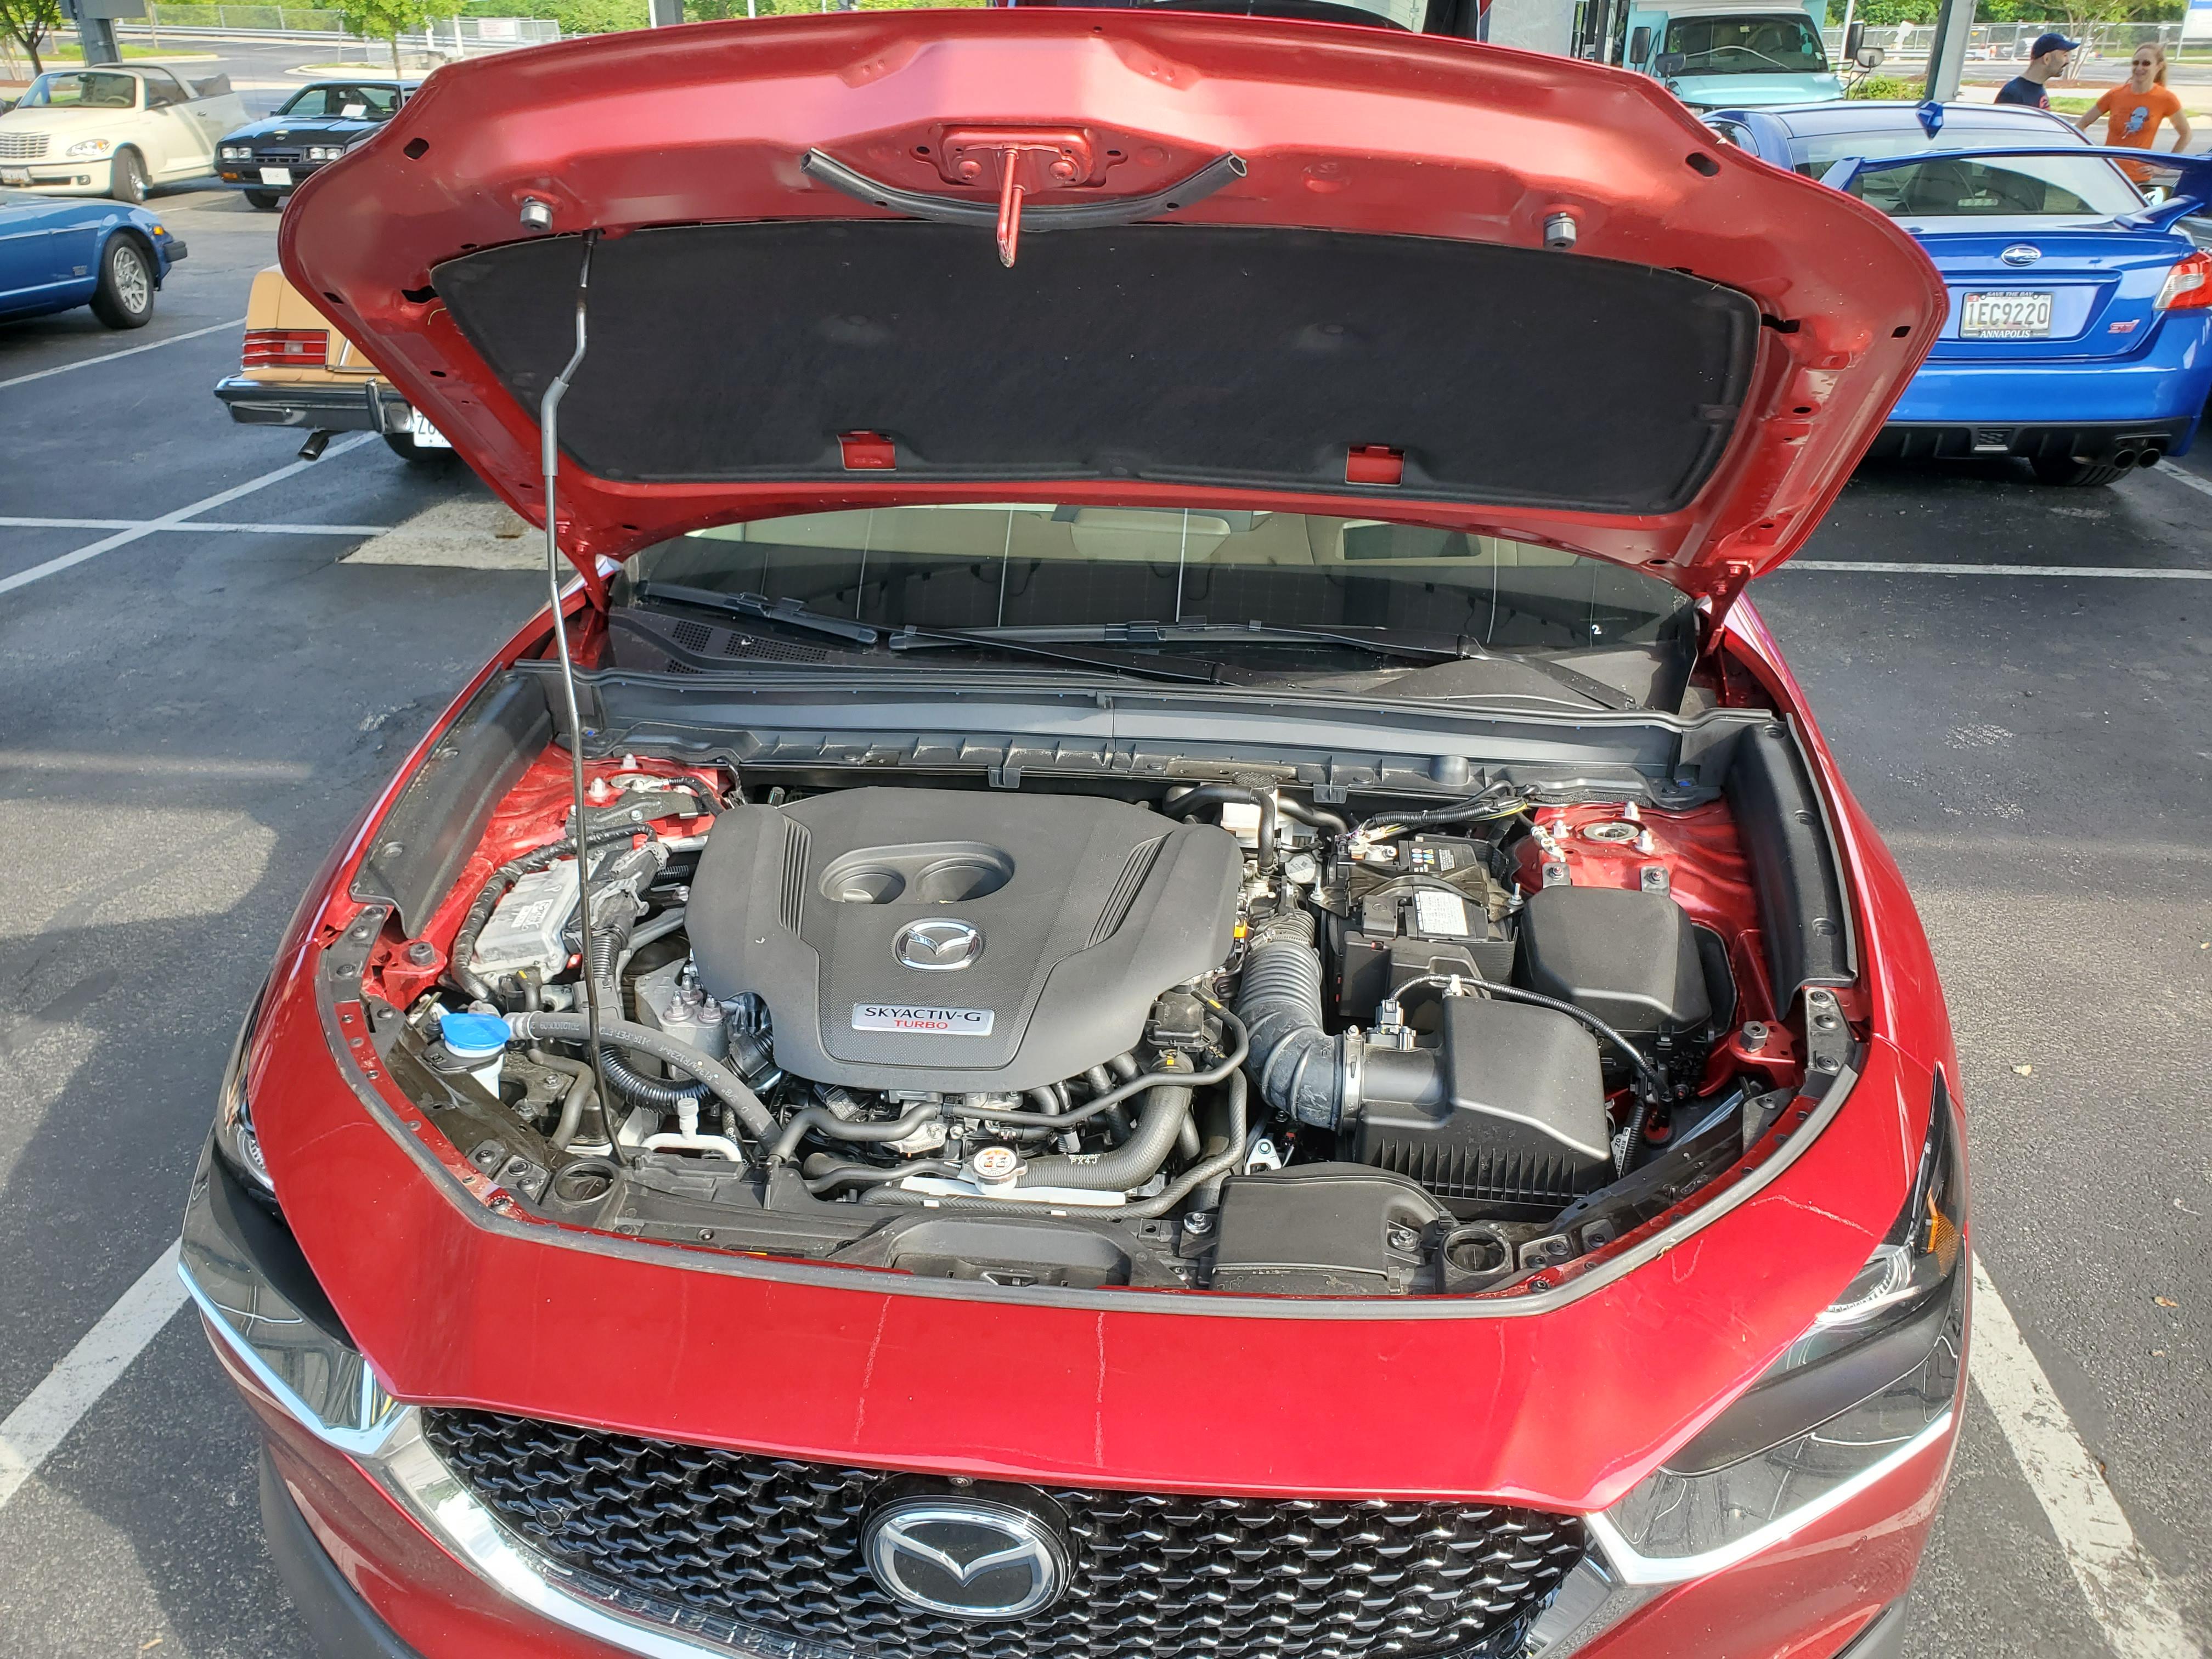 hood open showing the 2.5 skyactiv turbocharged engine of the mazda cx30